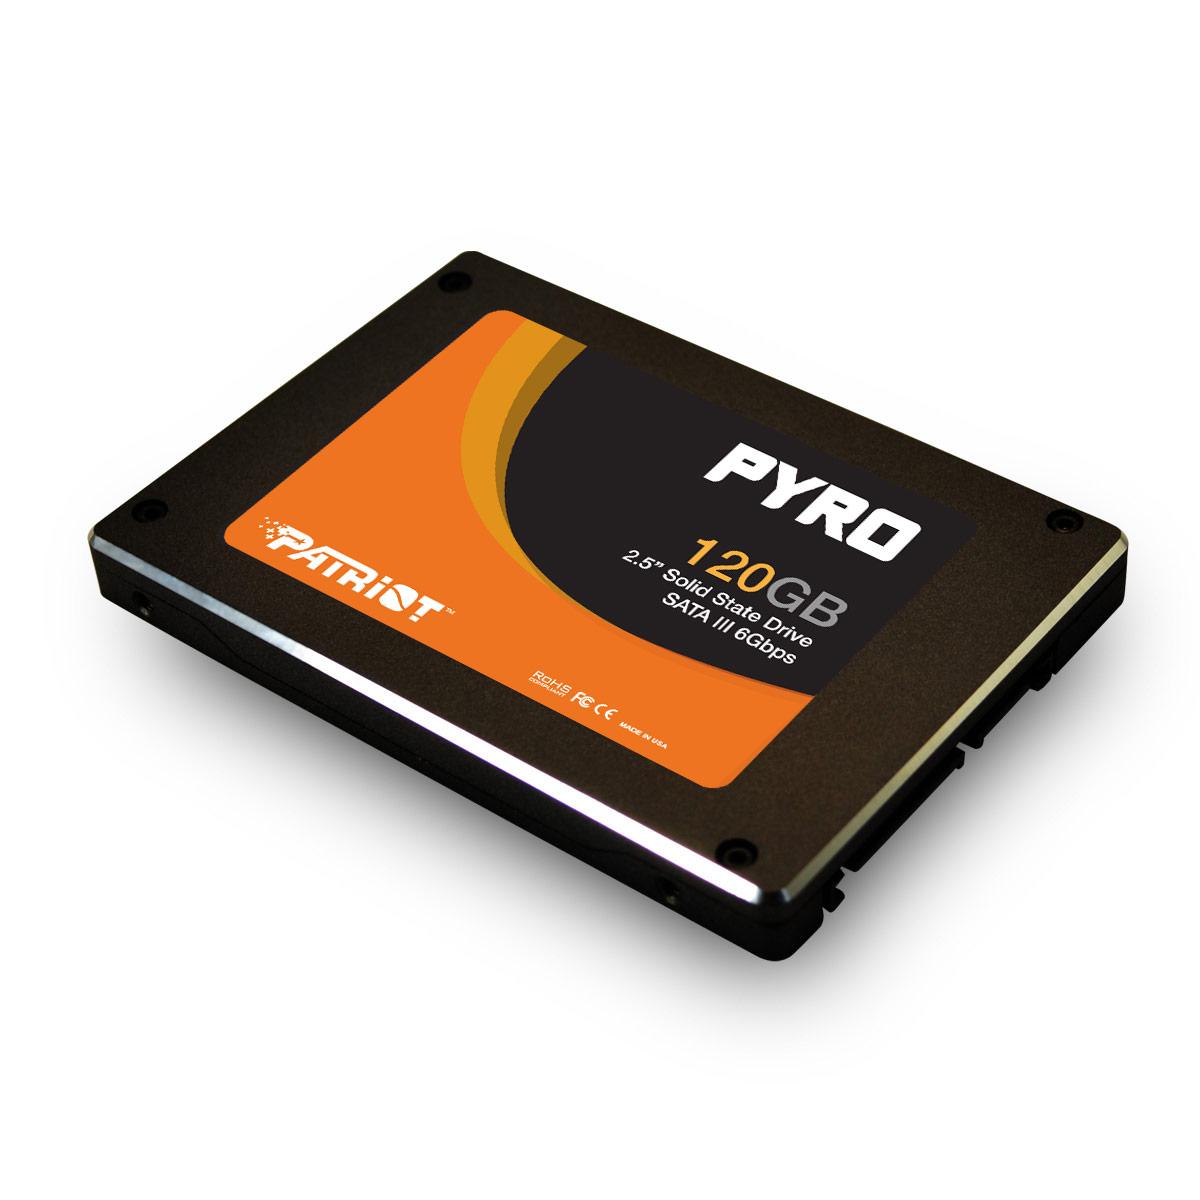 SSD 120GB PATRIOT PYRO  550/530MBs 85K